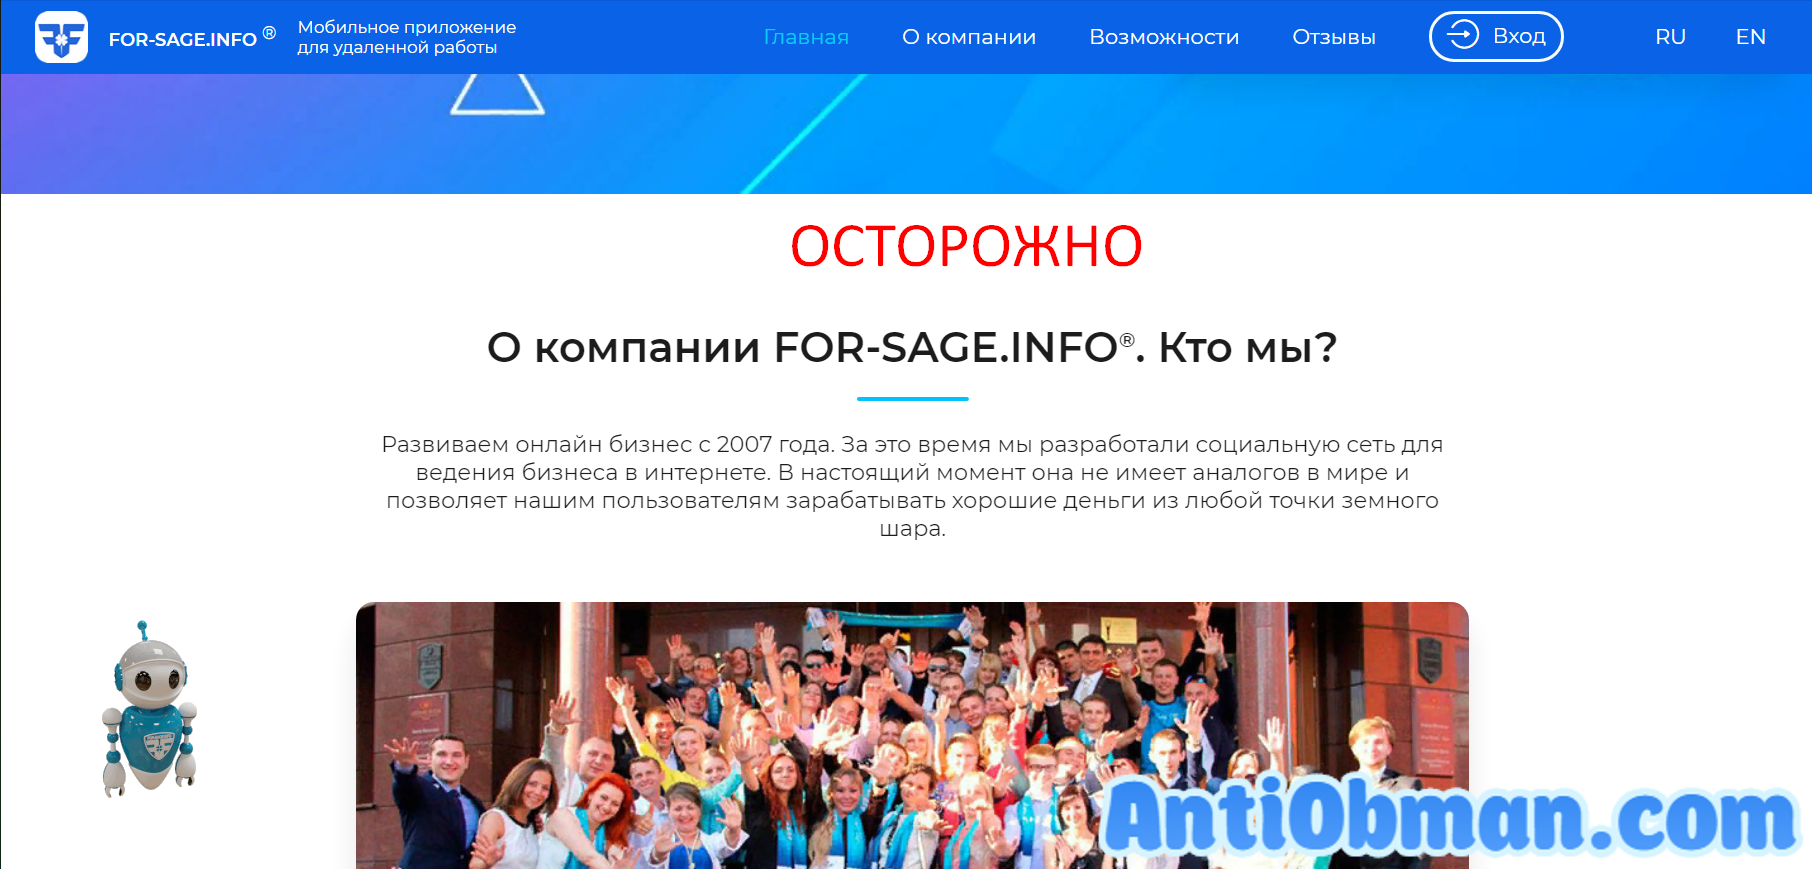 For-sage.info о компании